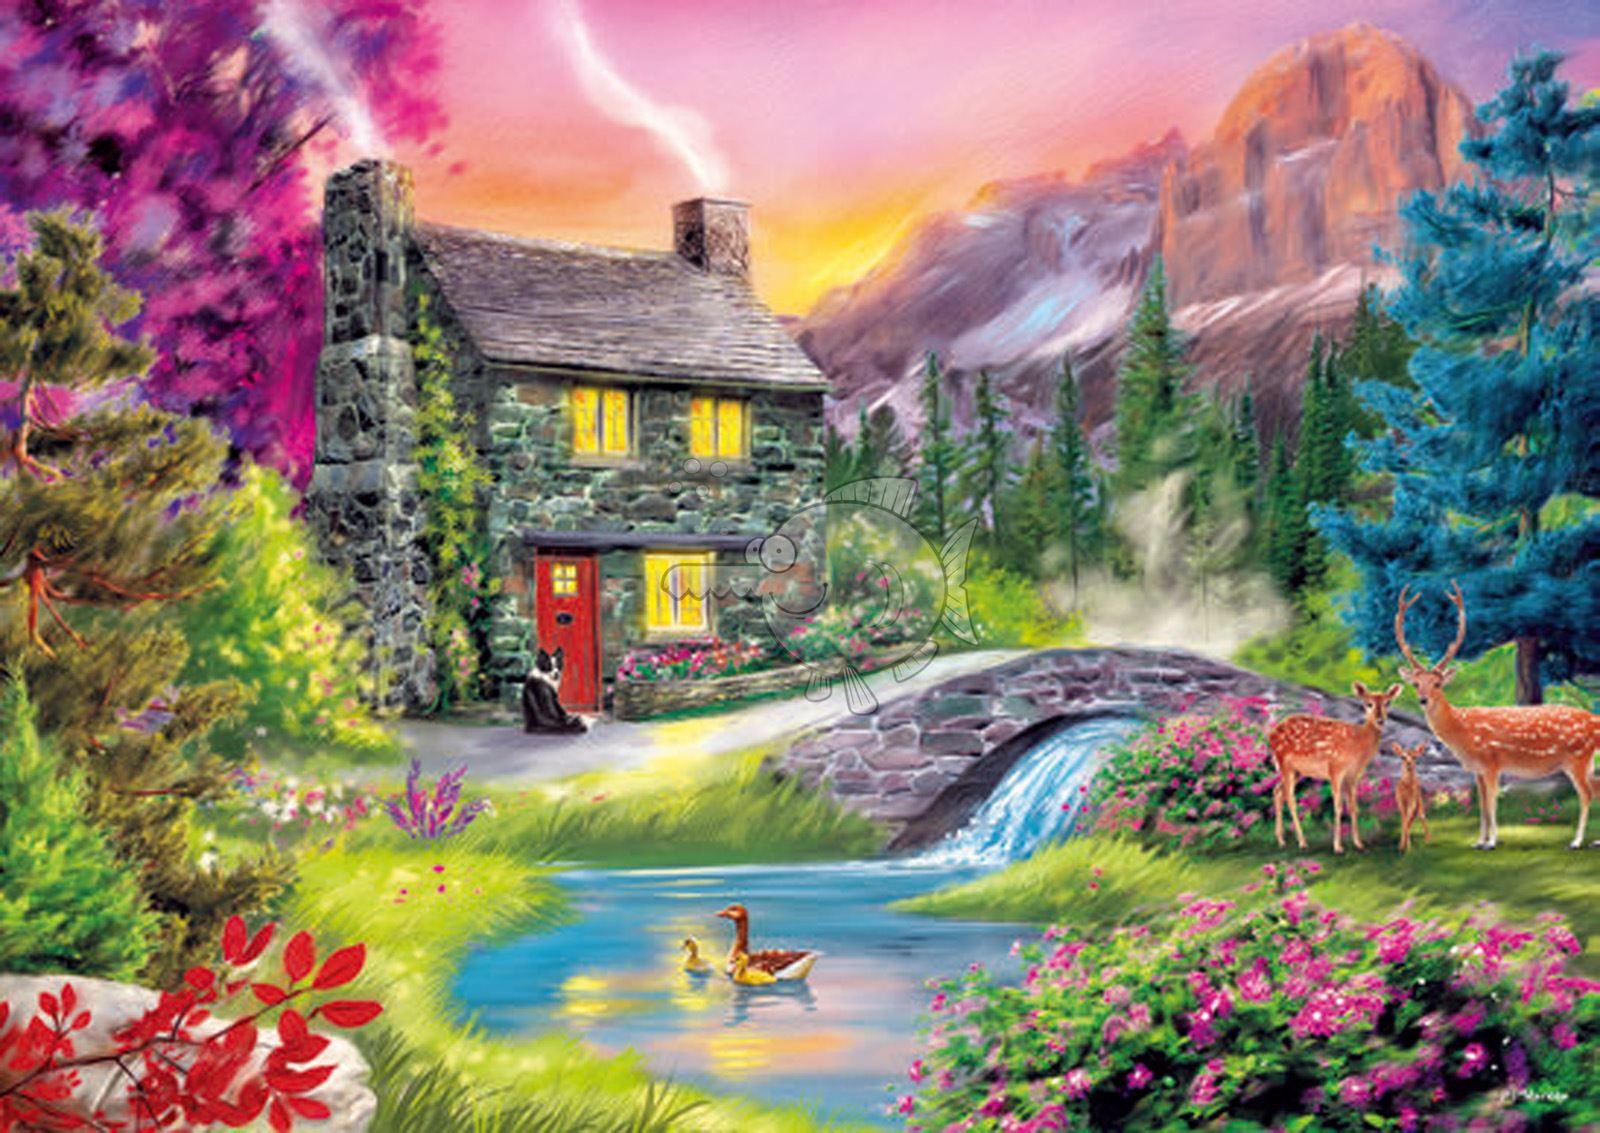 Trefl-300-500-1000-1500-2000-3000-4000-6000-Piece-Jigsaw-Puzzle-Landscapes-City thumbnail 233